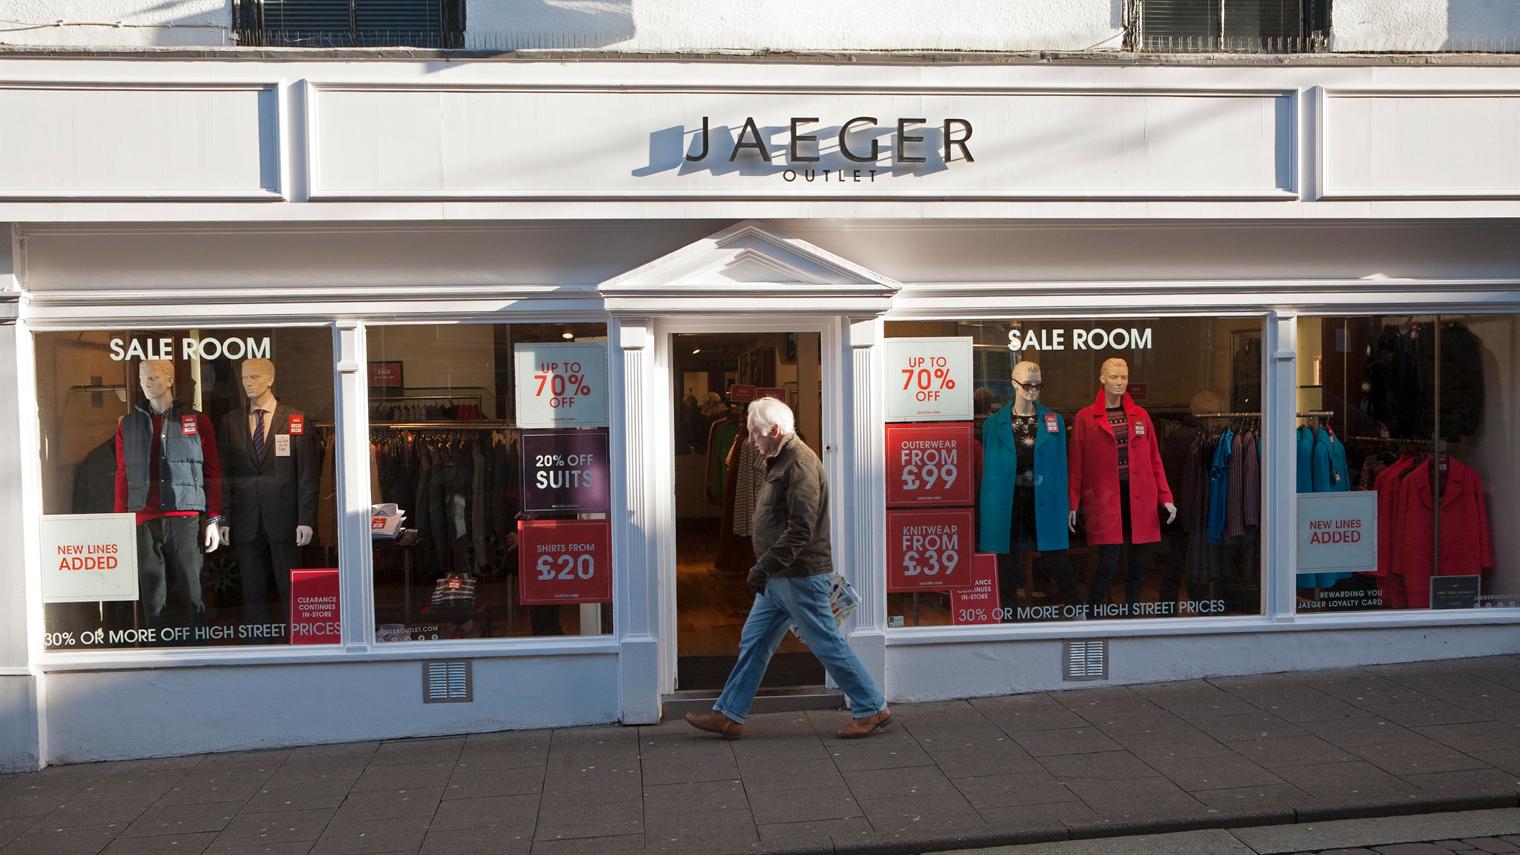 Jaeger shop